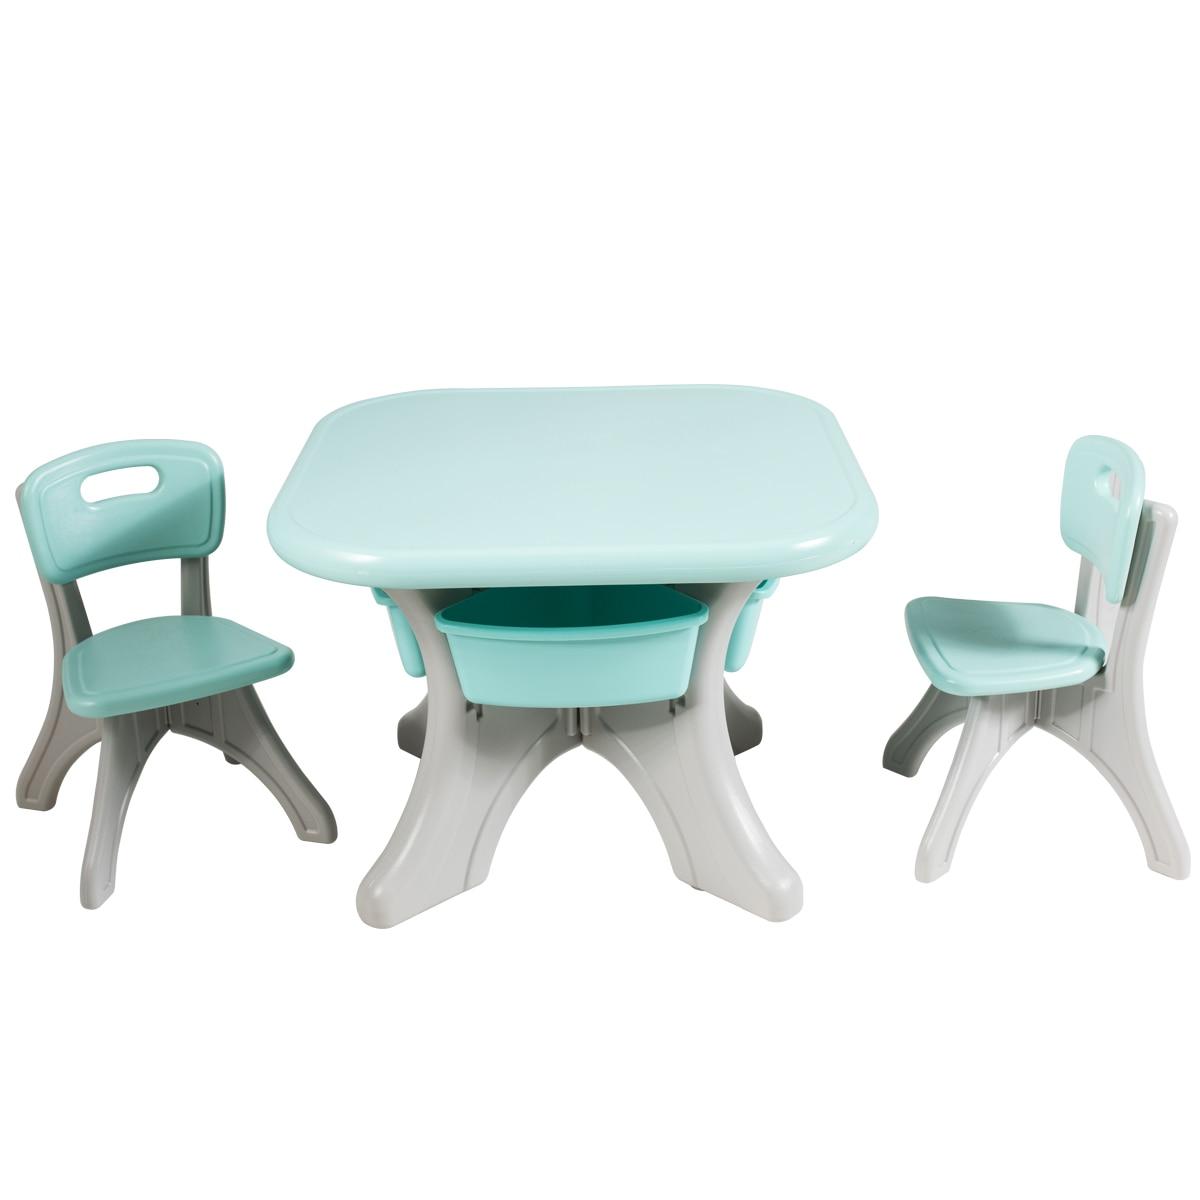 Picture of: Children Kids Activity Table Chair Set Play Furniture W Storage Garden Indoor Baby Seats Sofa Aliexpress